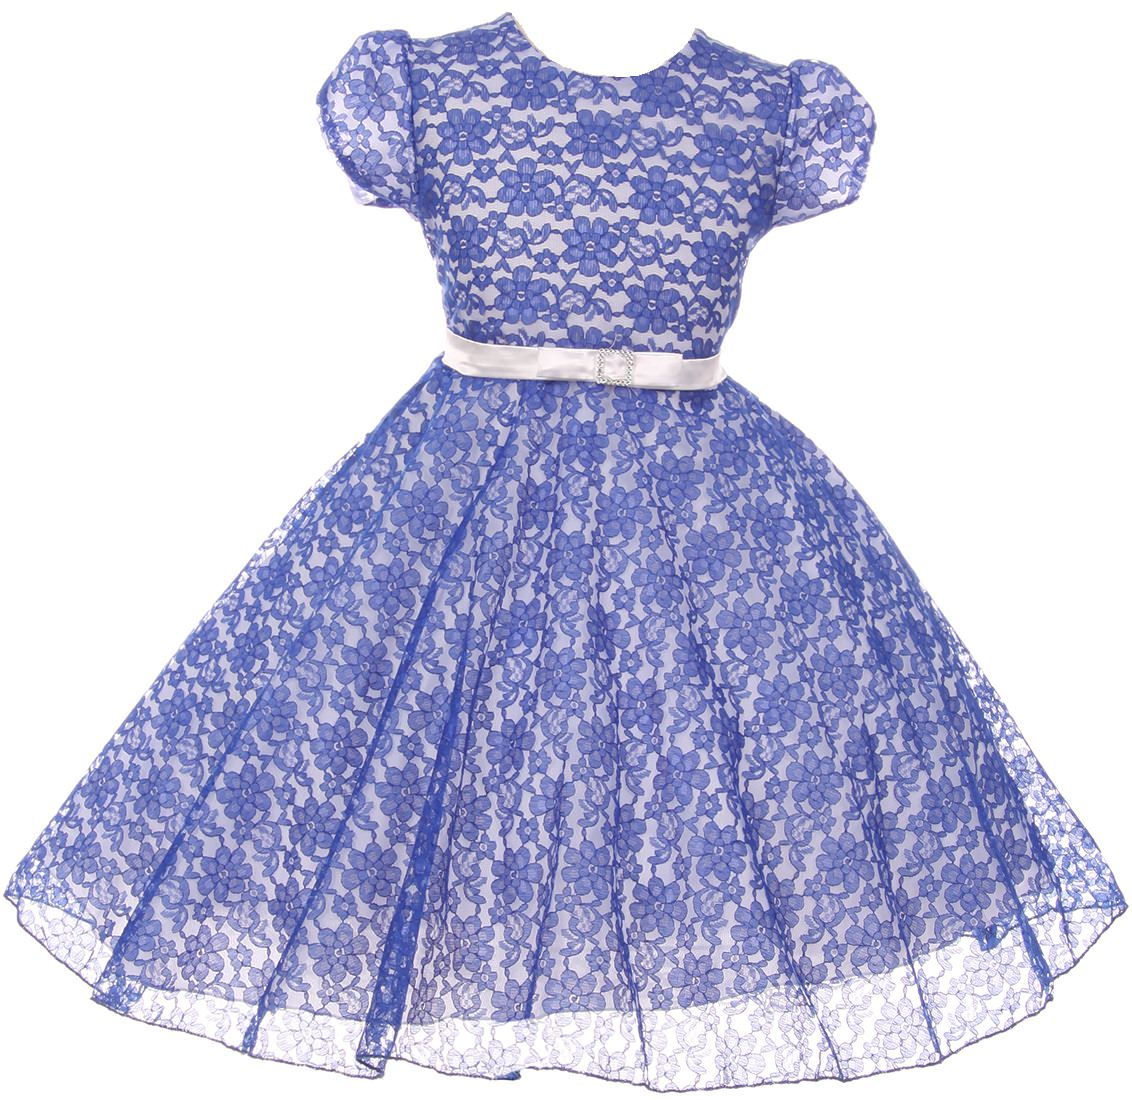 c7c009b4b02 Size 6x Flower Girl Dresses